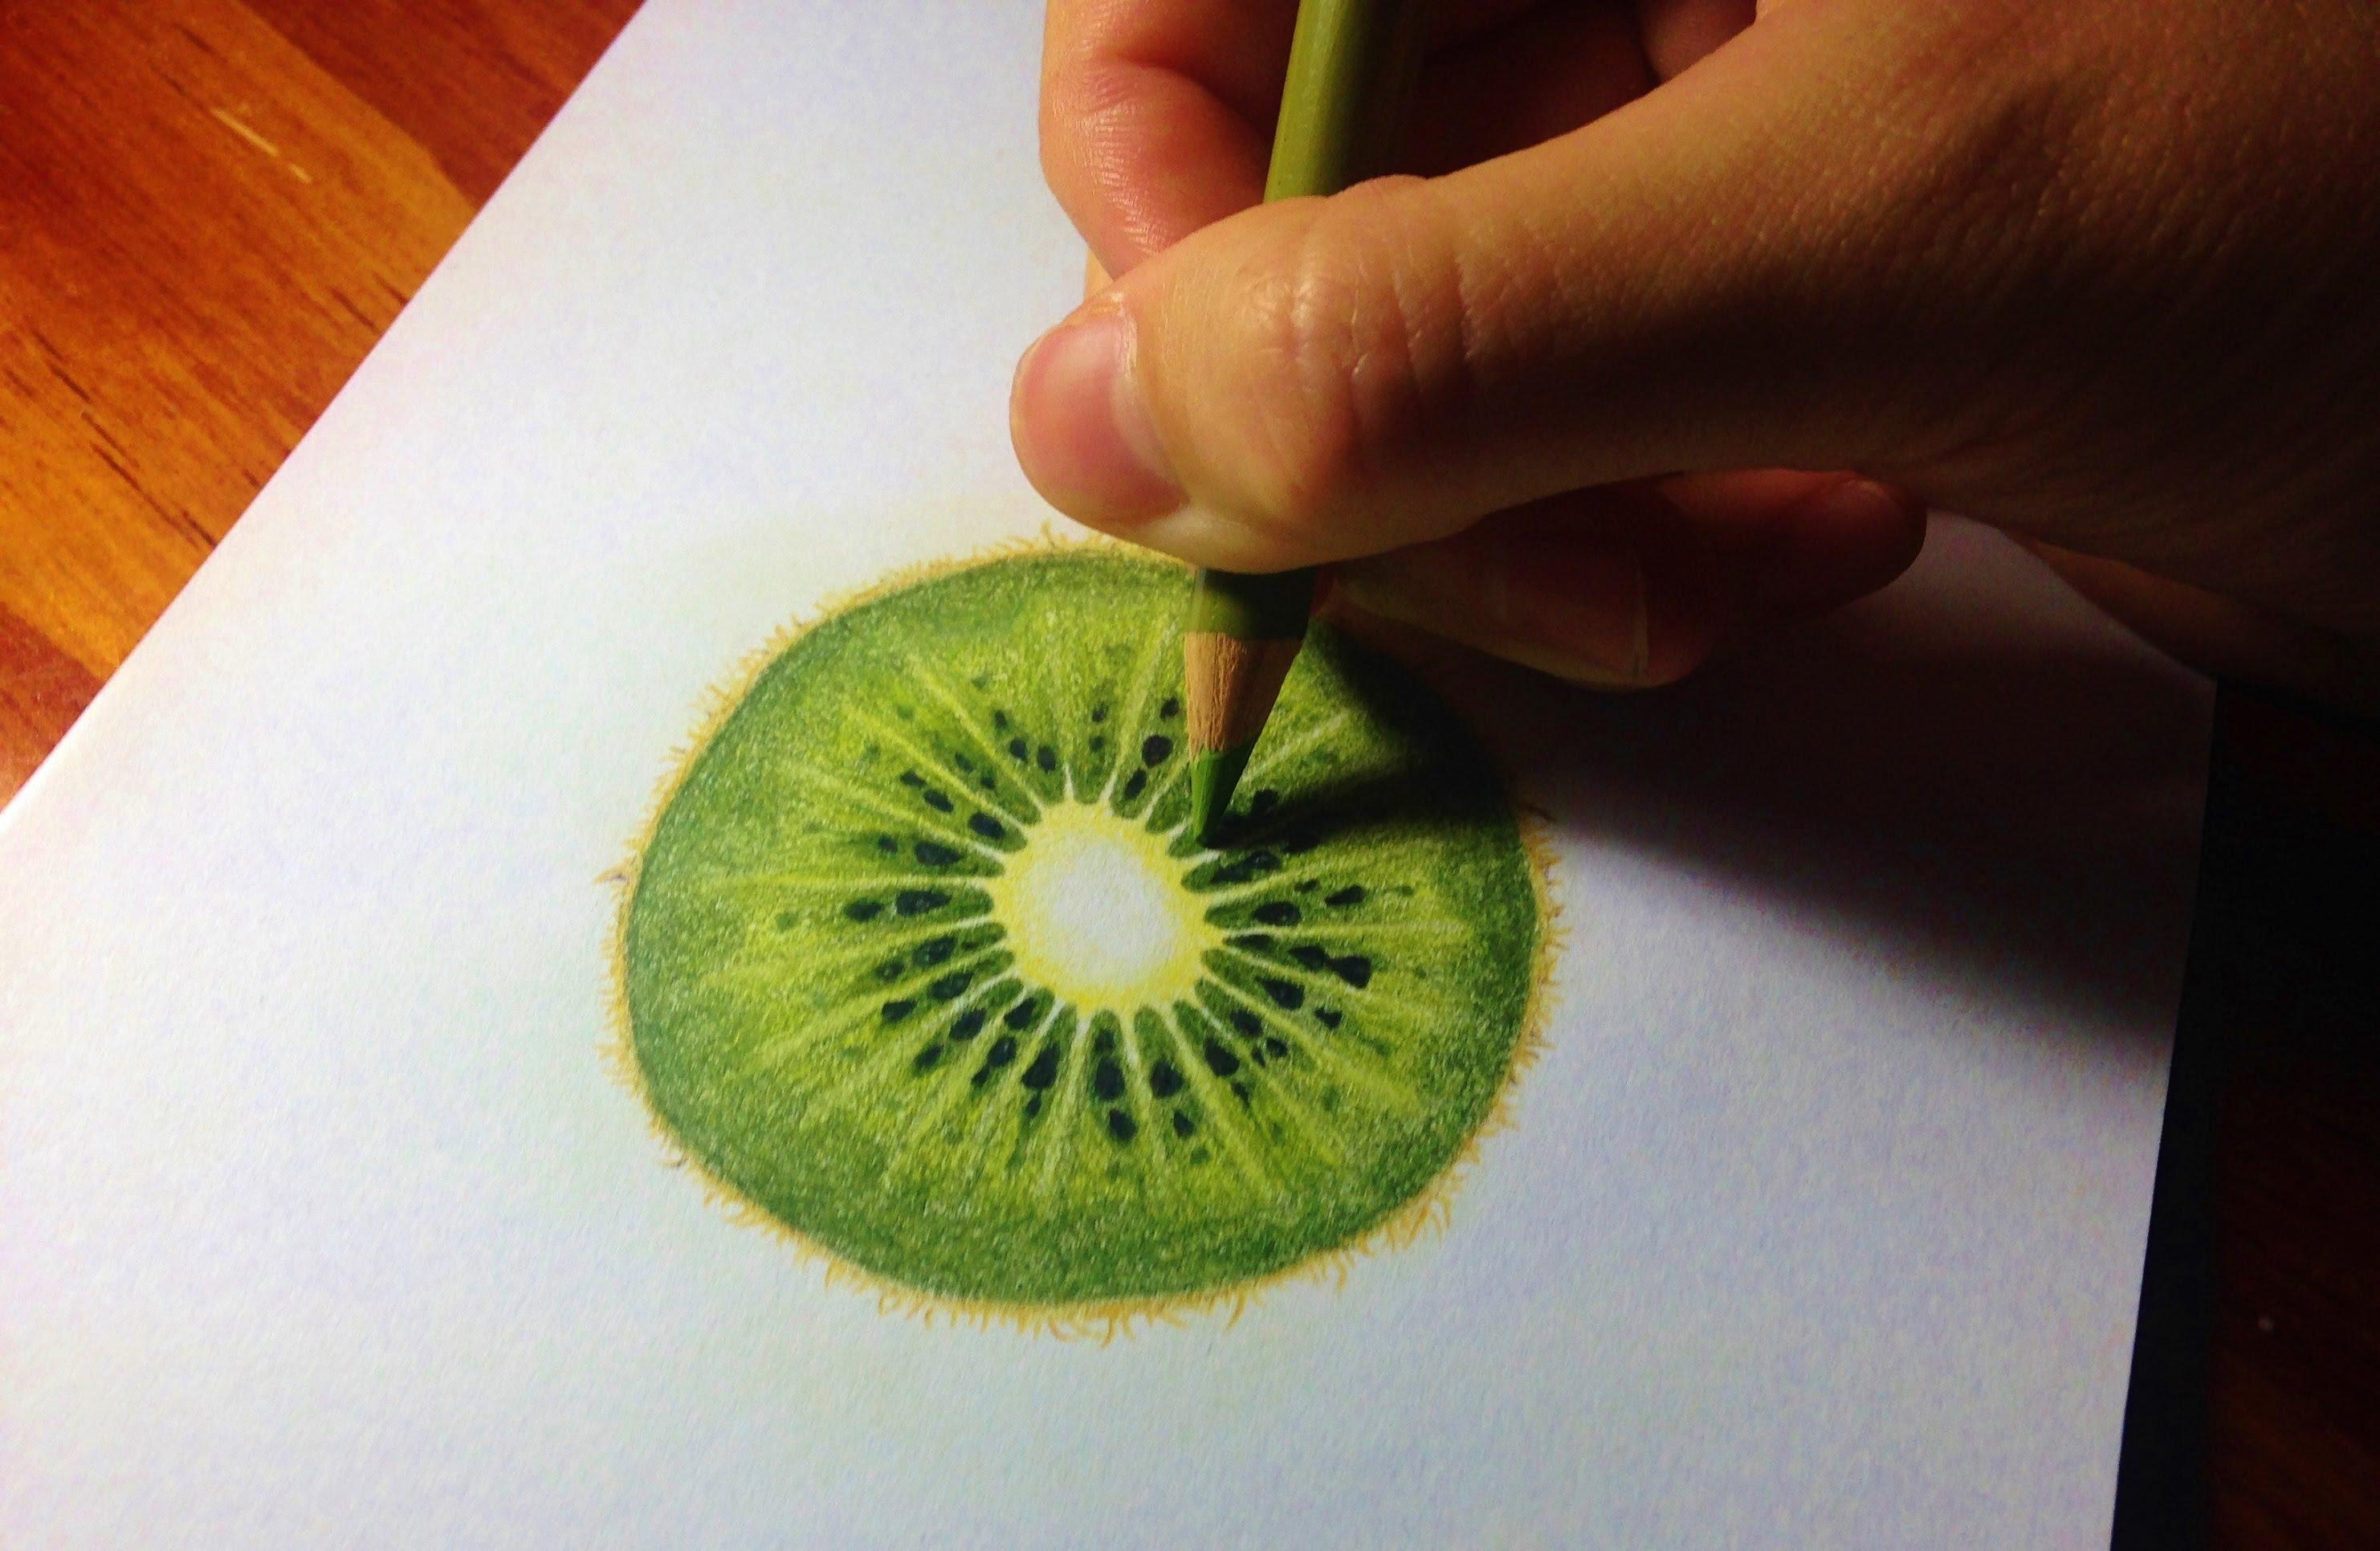 Kiwi Fruit Drawing at GetDrawings.com | Free for personal use Kiwi ...